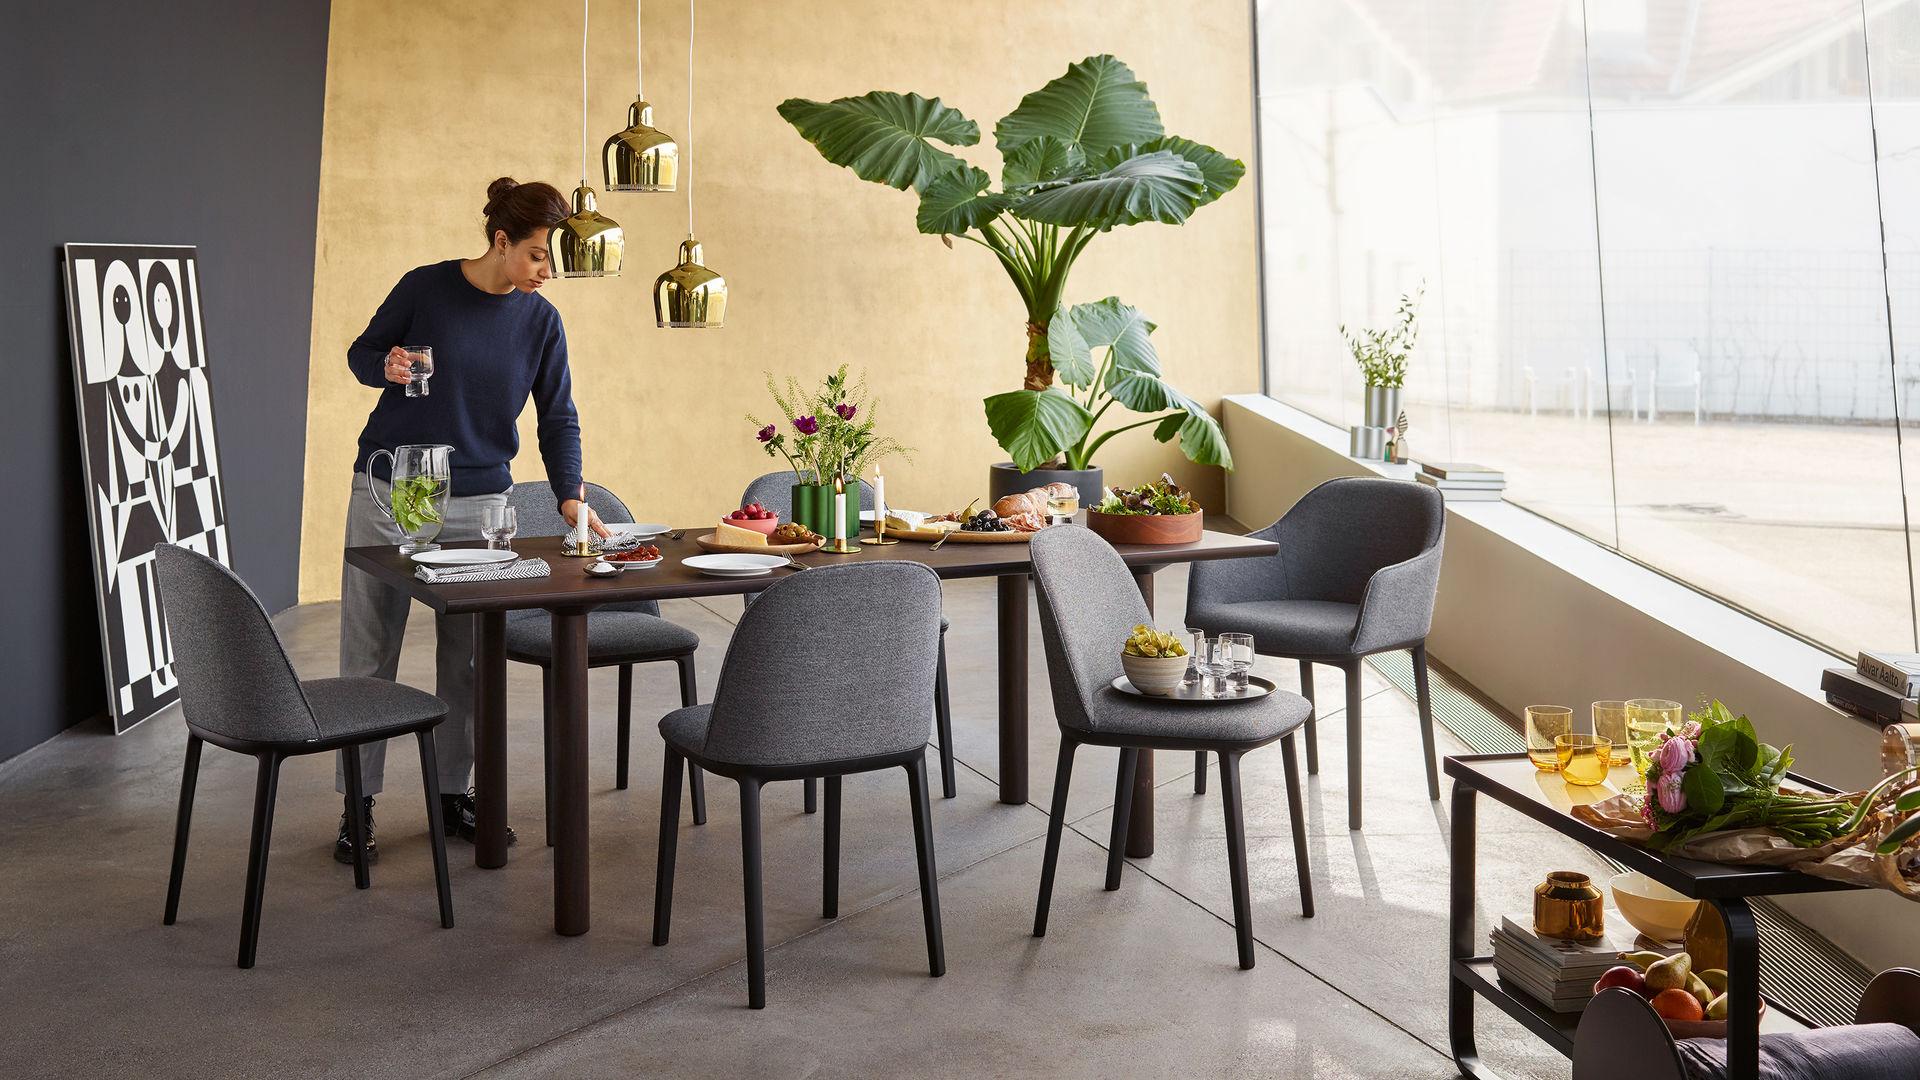 Softshell Side Chair Wood Table Environmental Enrichment Panels Tea Trolley Candle Holder_web_16-9